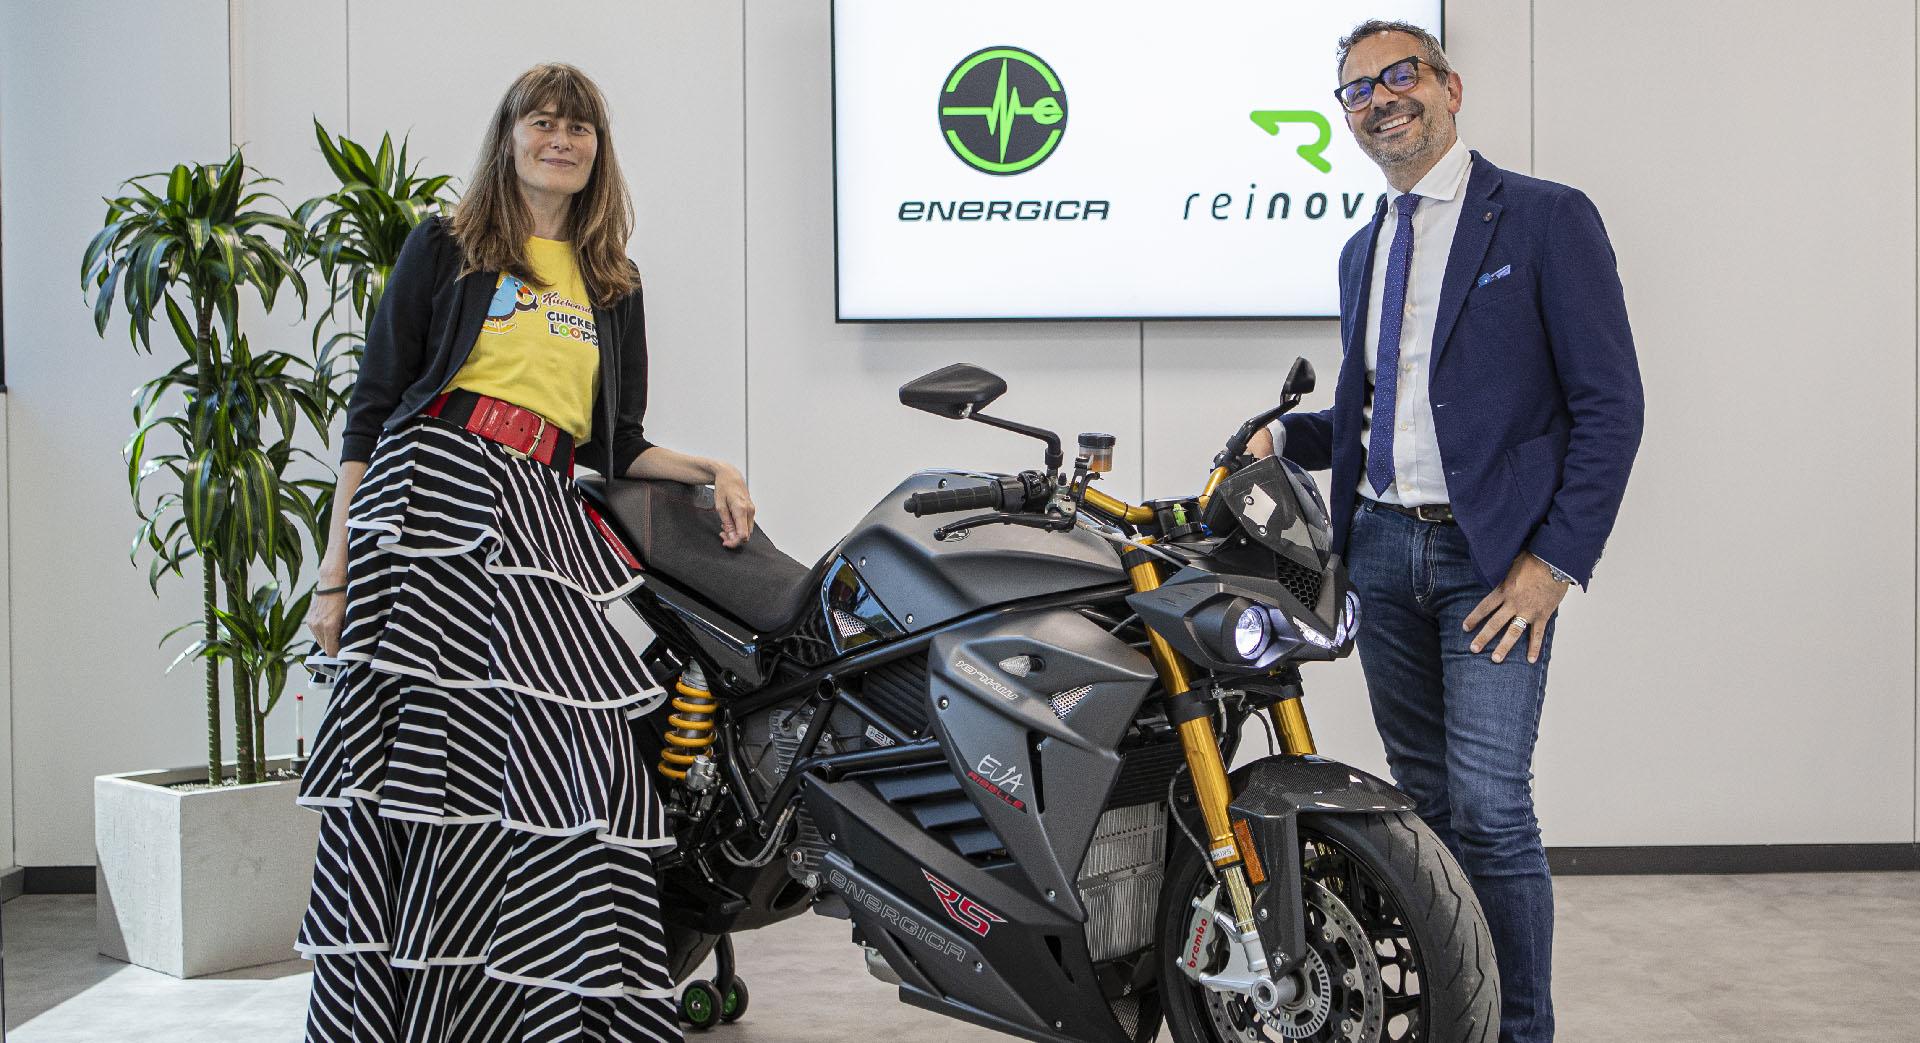 Nuova partnership tecnologica tra Energica Motor Company S.p.A. e Reinova